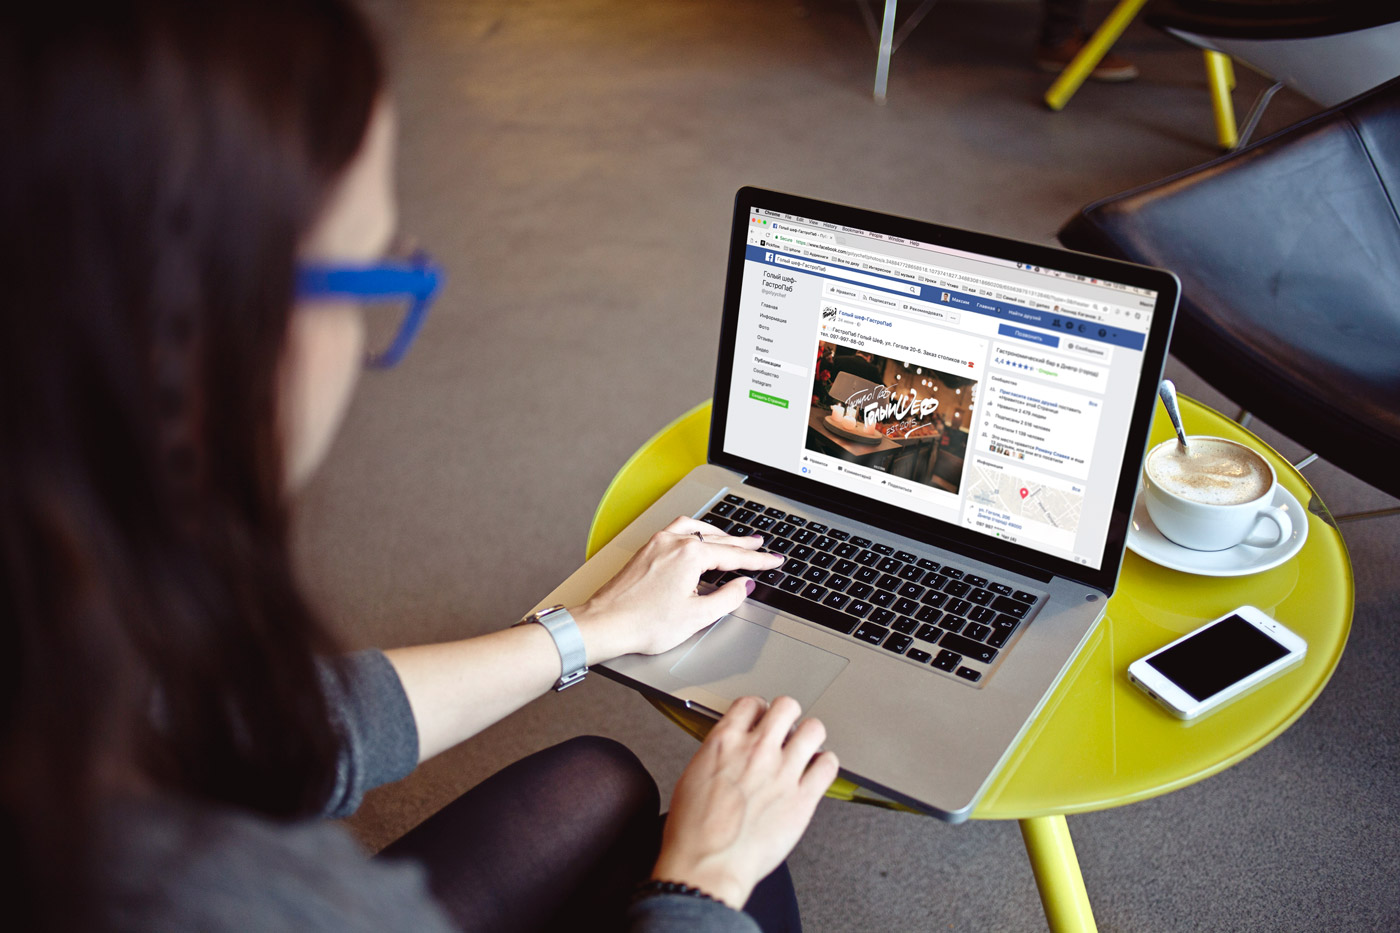 Интернет реклама кафе сайт seo форум